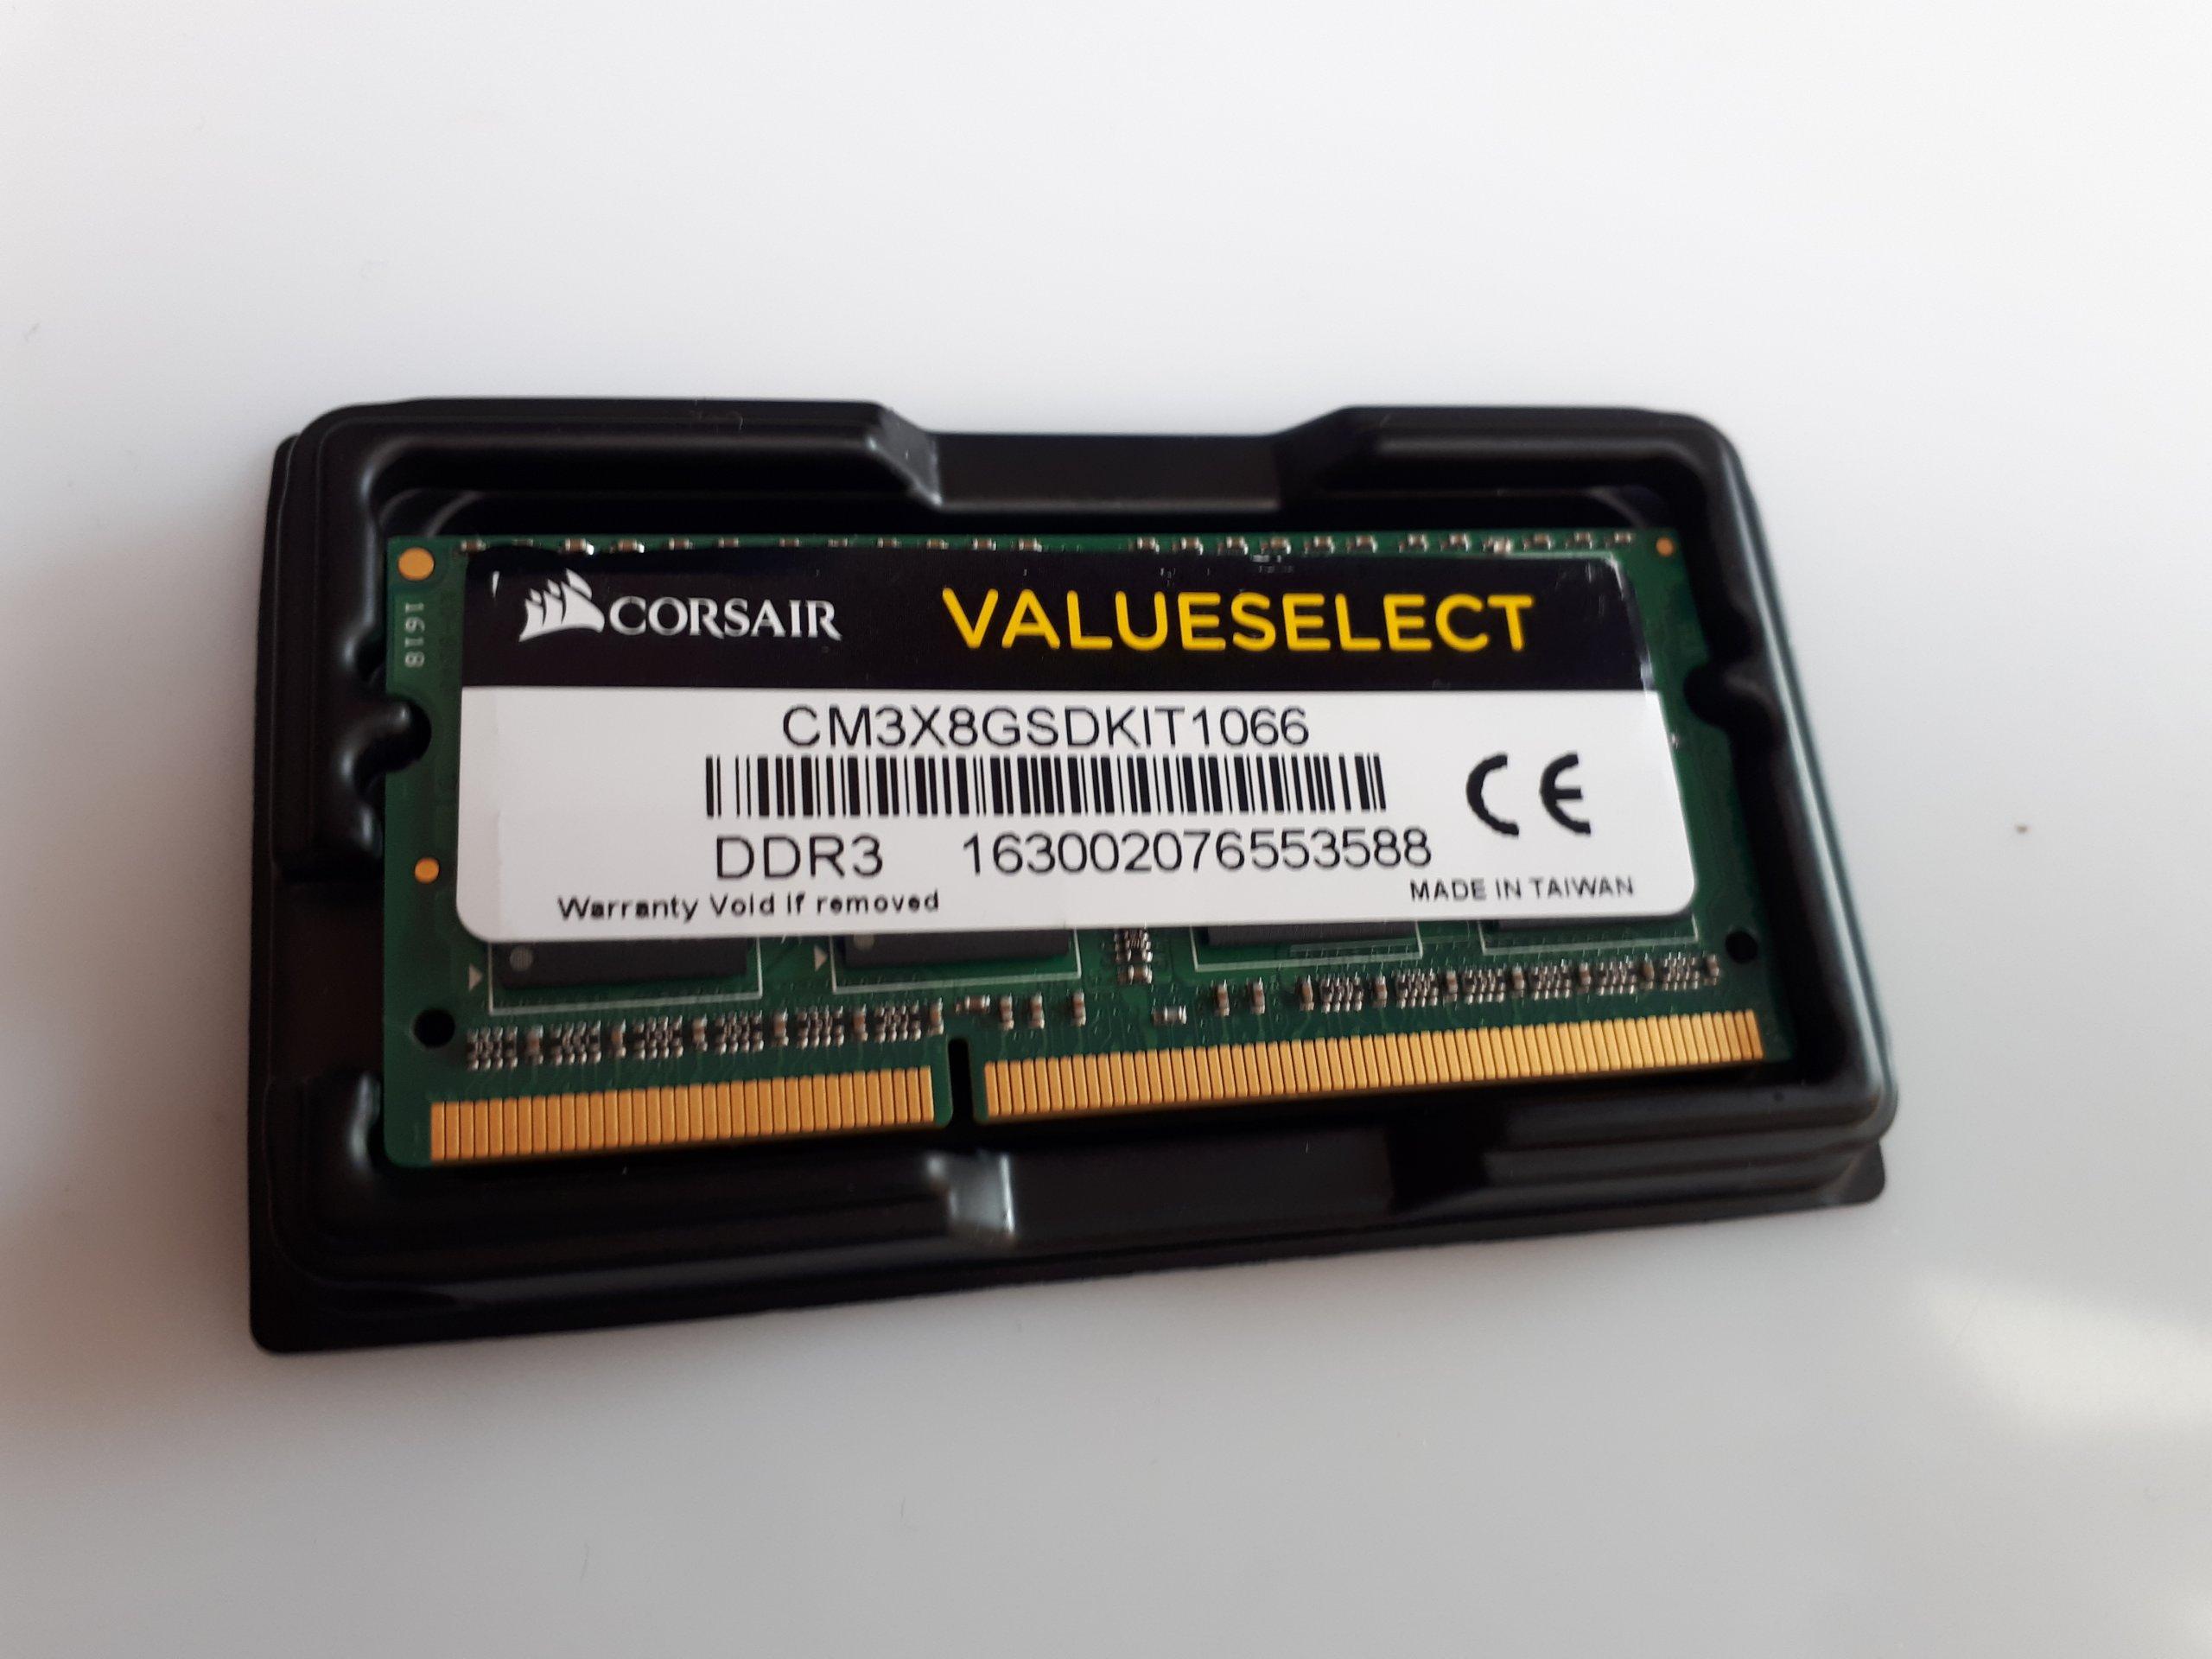 C2 CORSAIR DDR3 4GB 1066MHz CL7 1.5V VELUESELECT